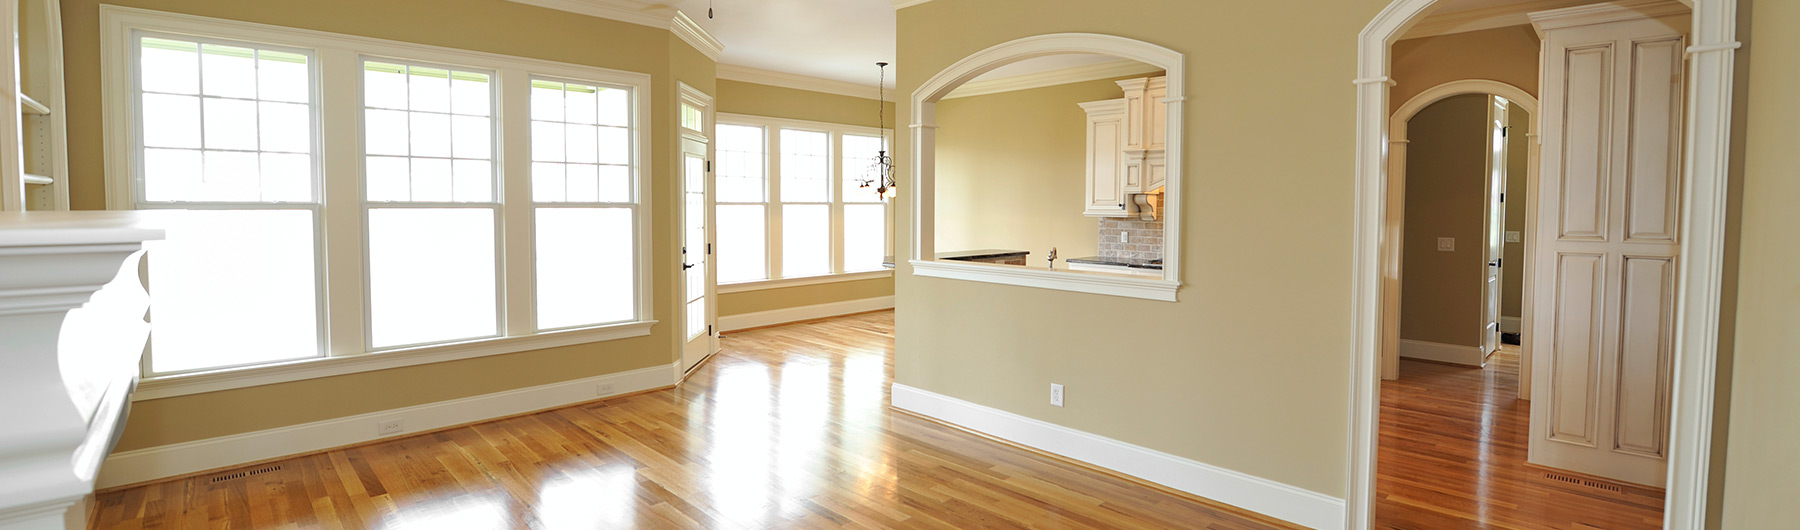 painting-eco-home-improvement (3).jpg